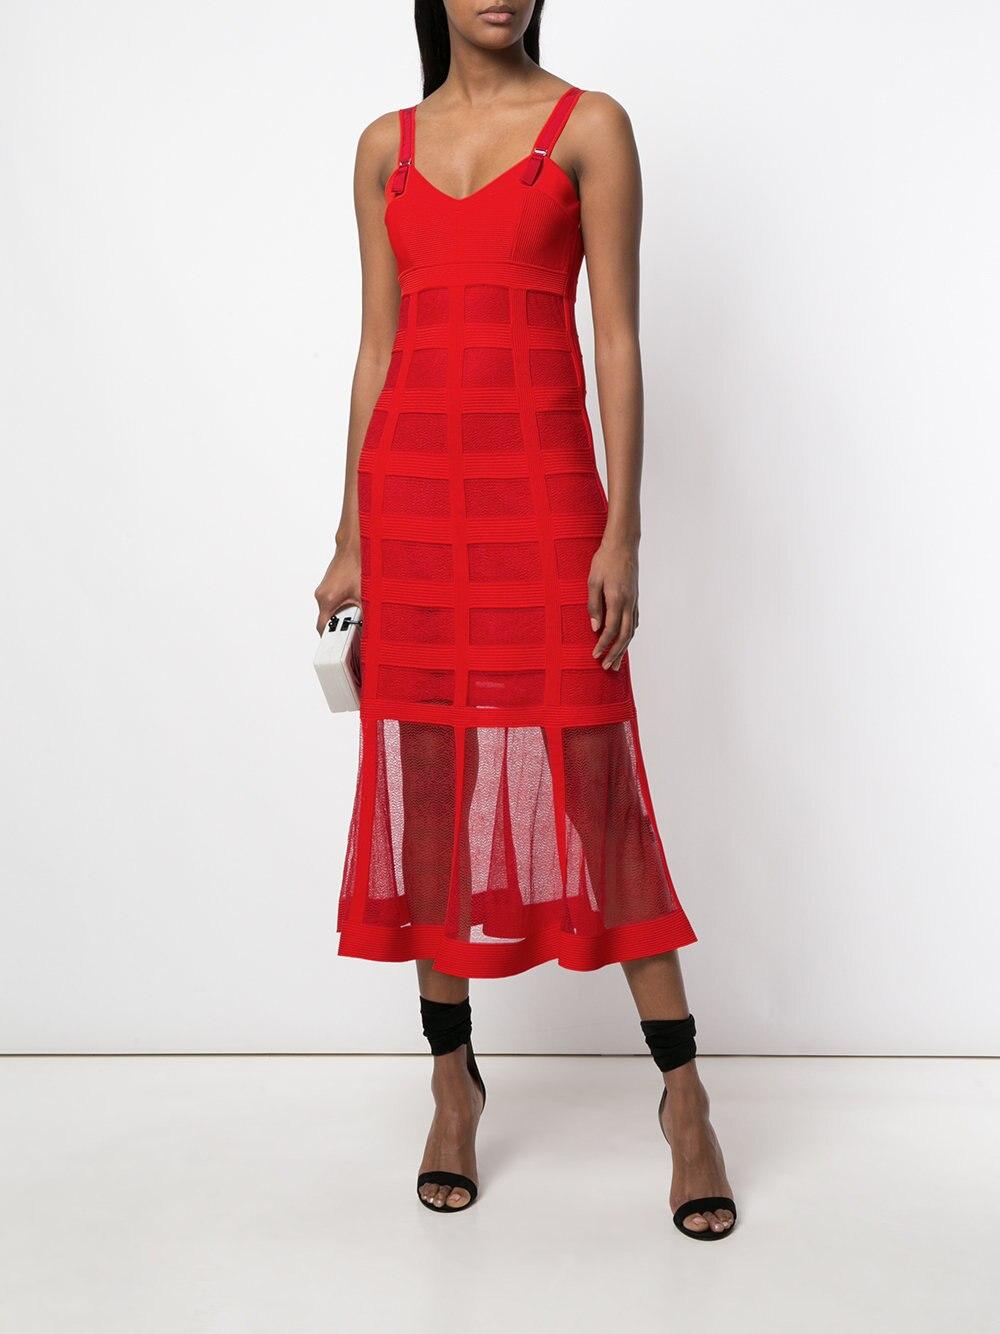 c290b809dff Robe Sexy Bandage Rouge Mesh Celebrity Spaghetti Party Long En Robes Starp  Élégant Corps Con cou Femmes ...